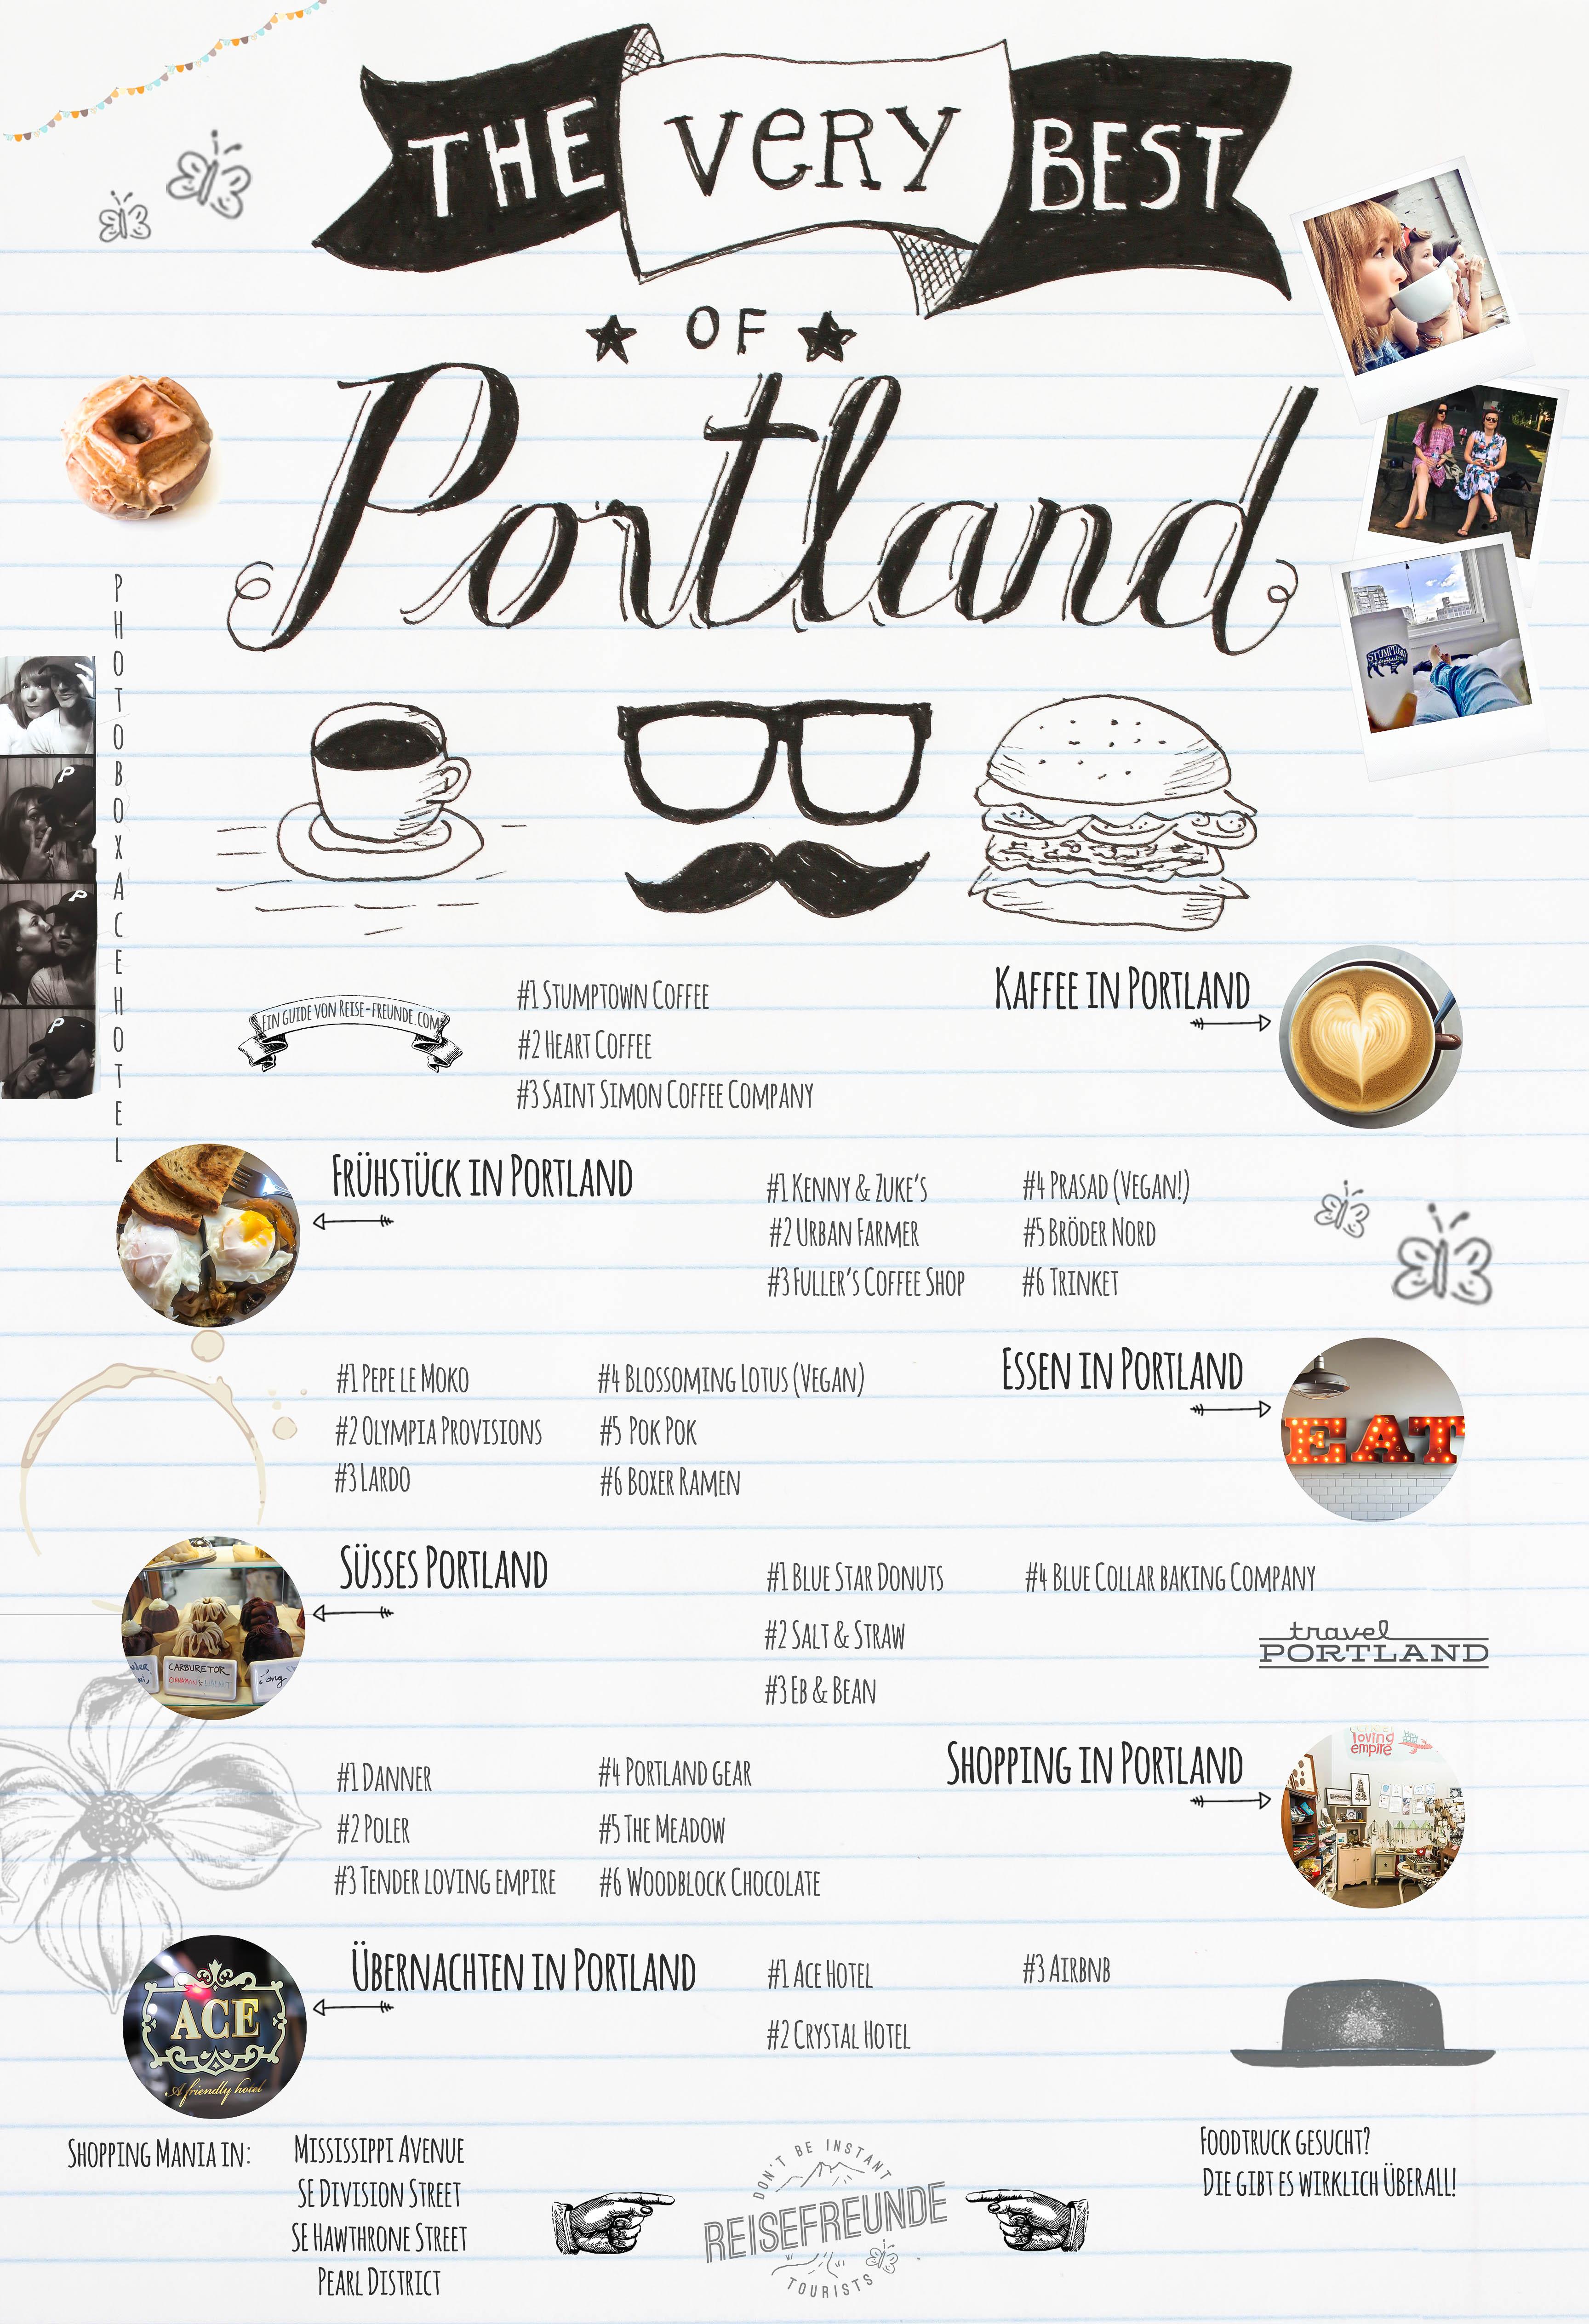 Portland Guide Blog Reisefreunde